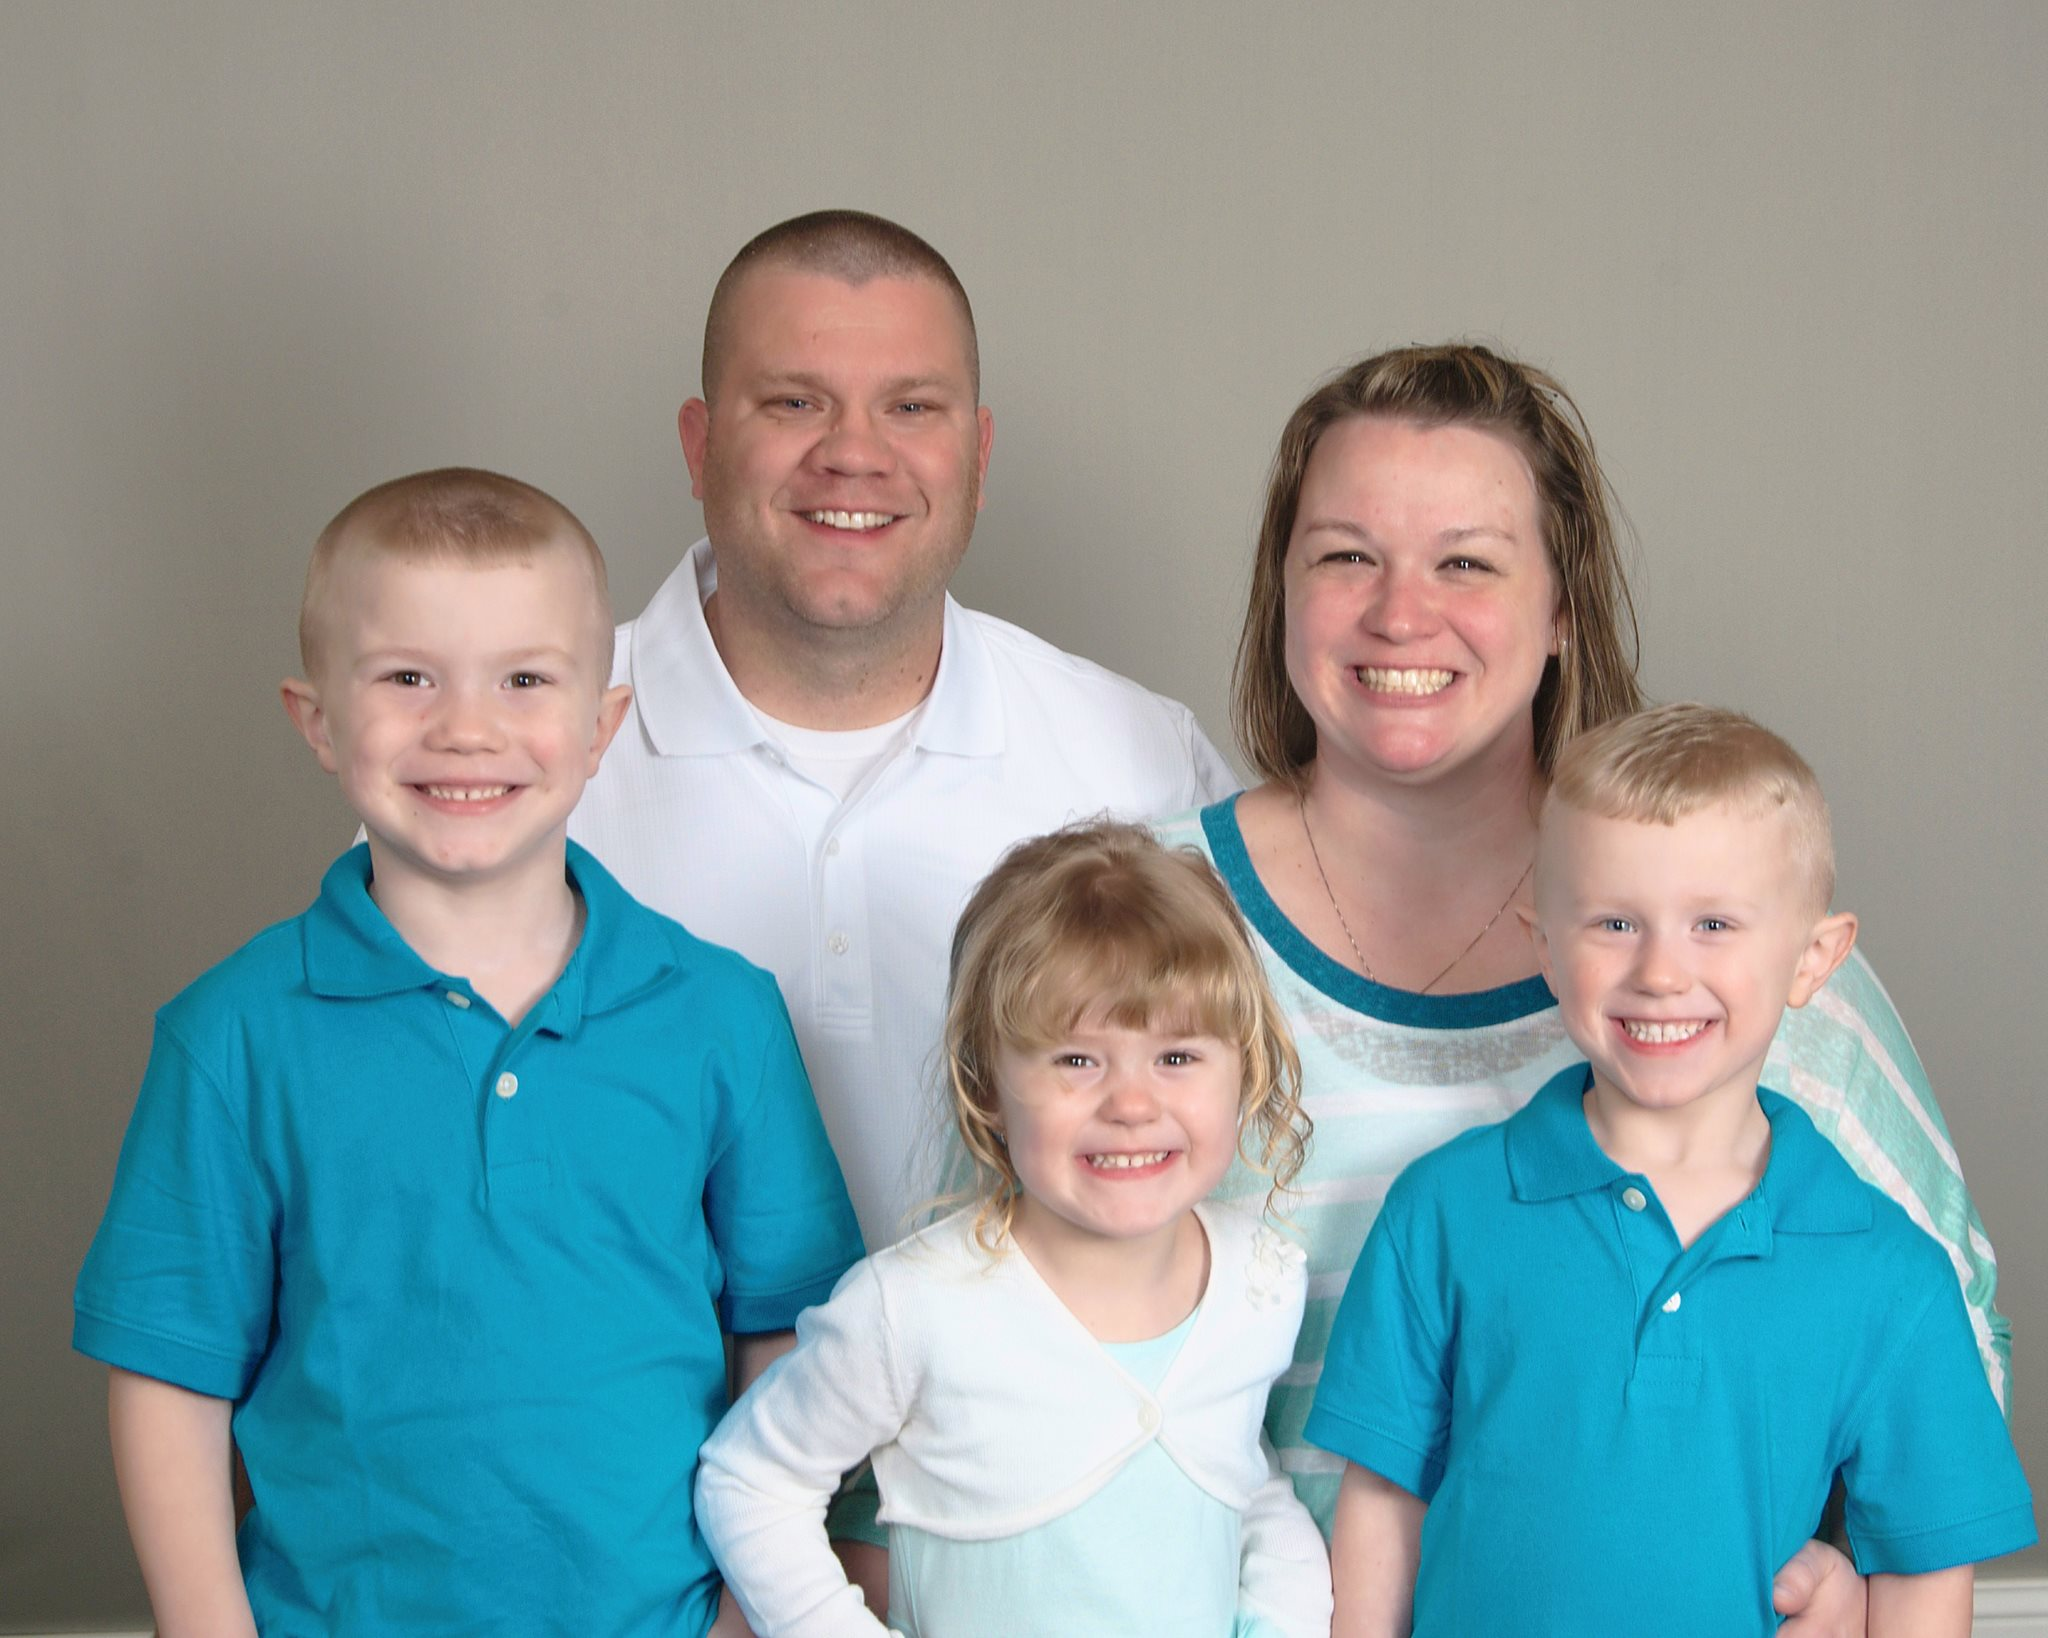 Christopher George & Suzanne Kopp with their children Jacob, Benjamin and Baylee Kopp